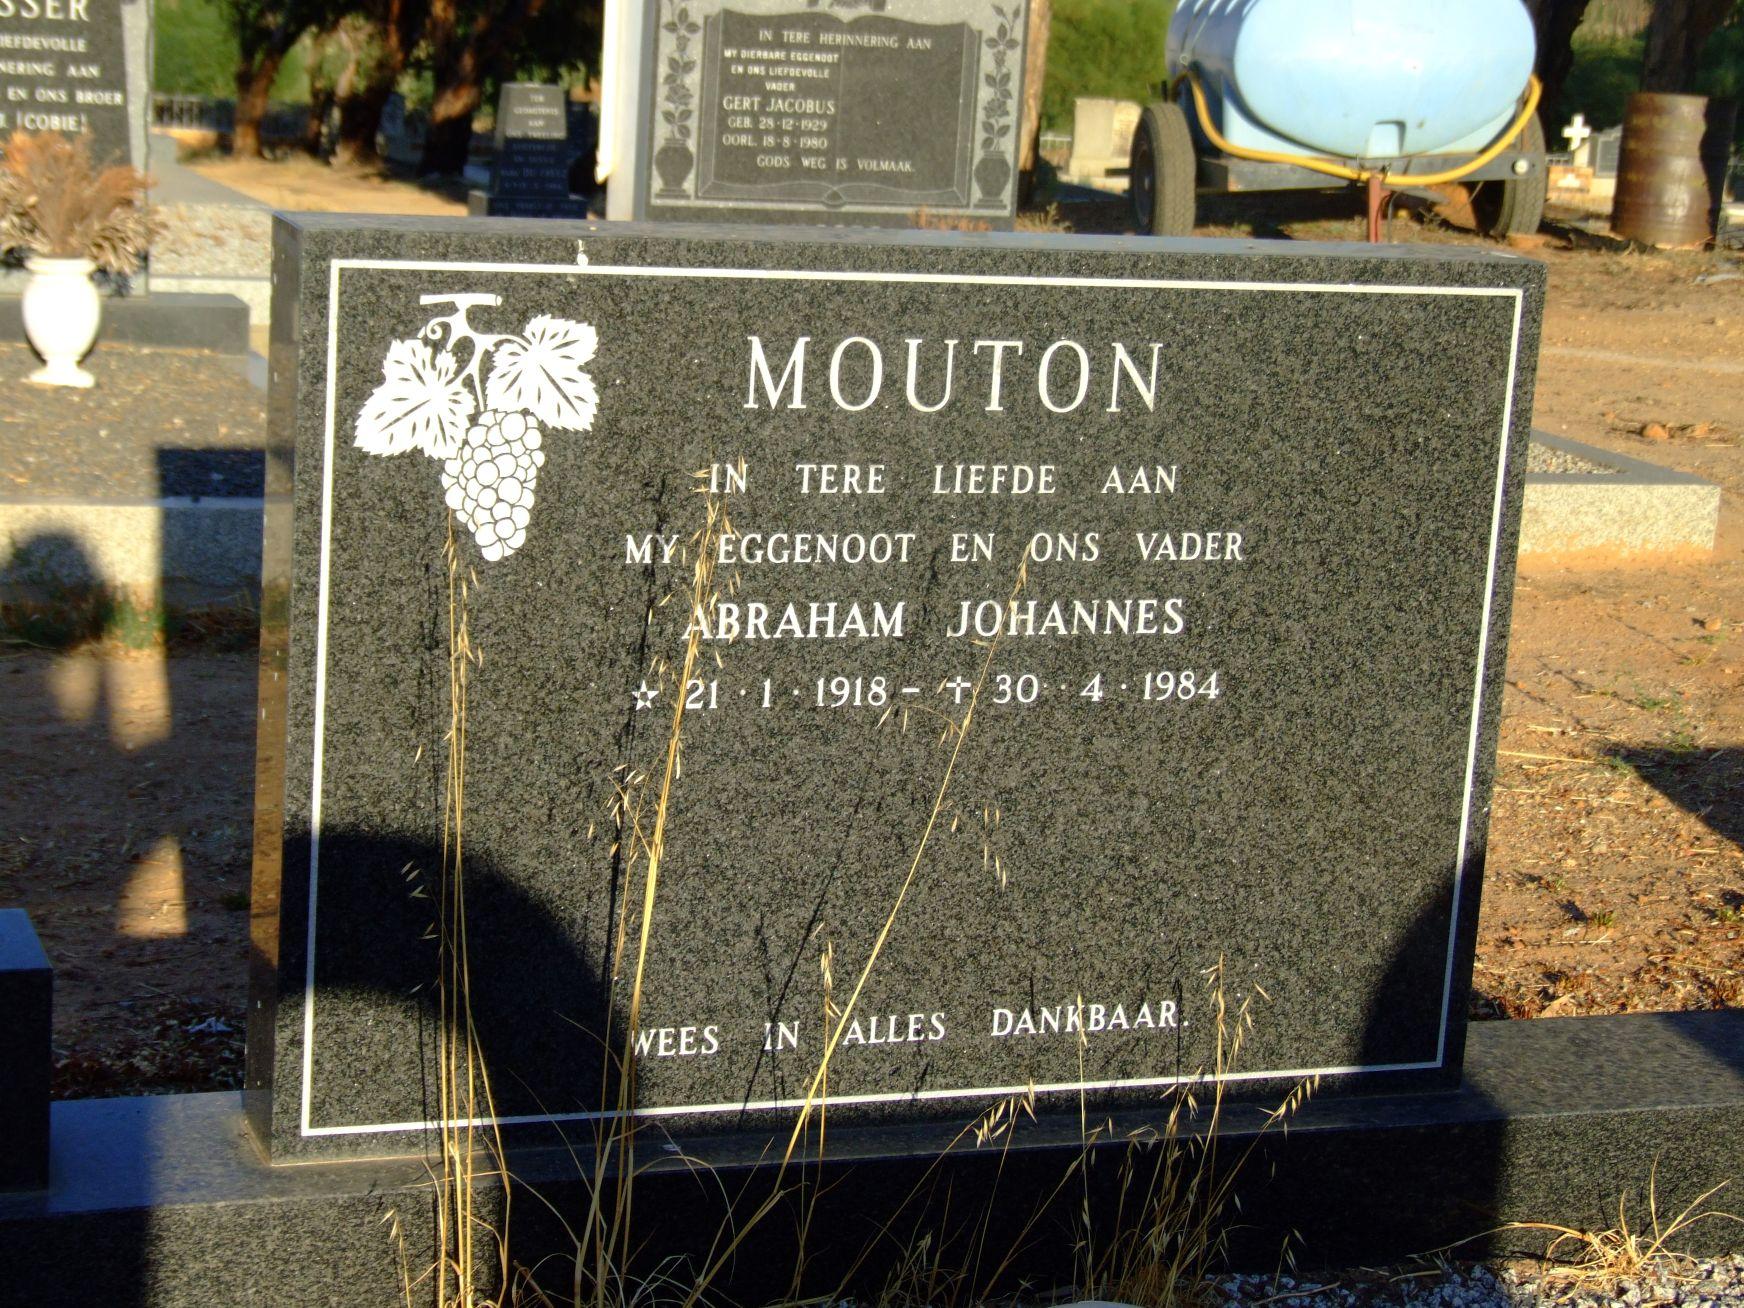 Mouton, Abraham Johannes